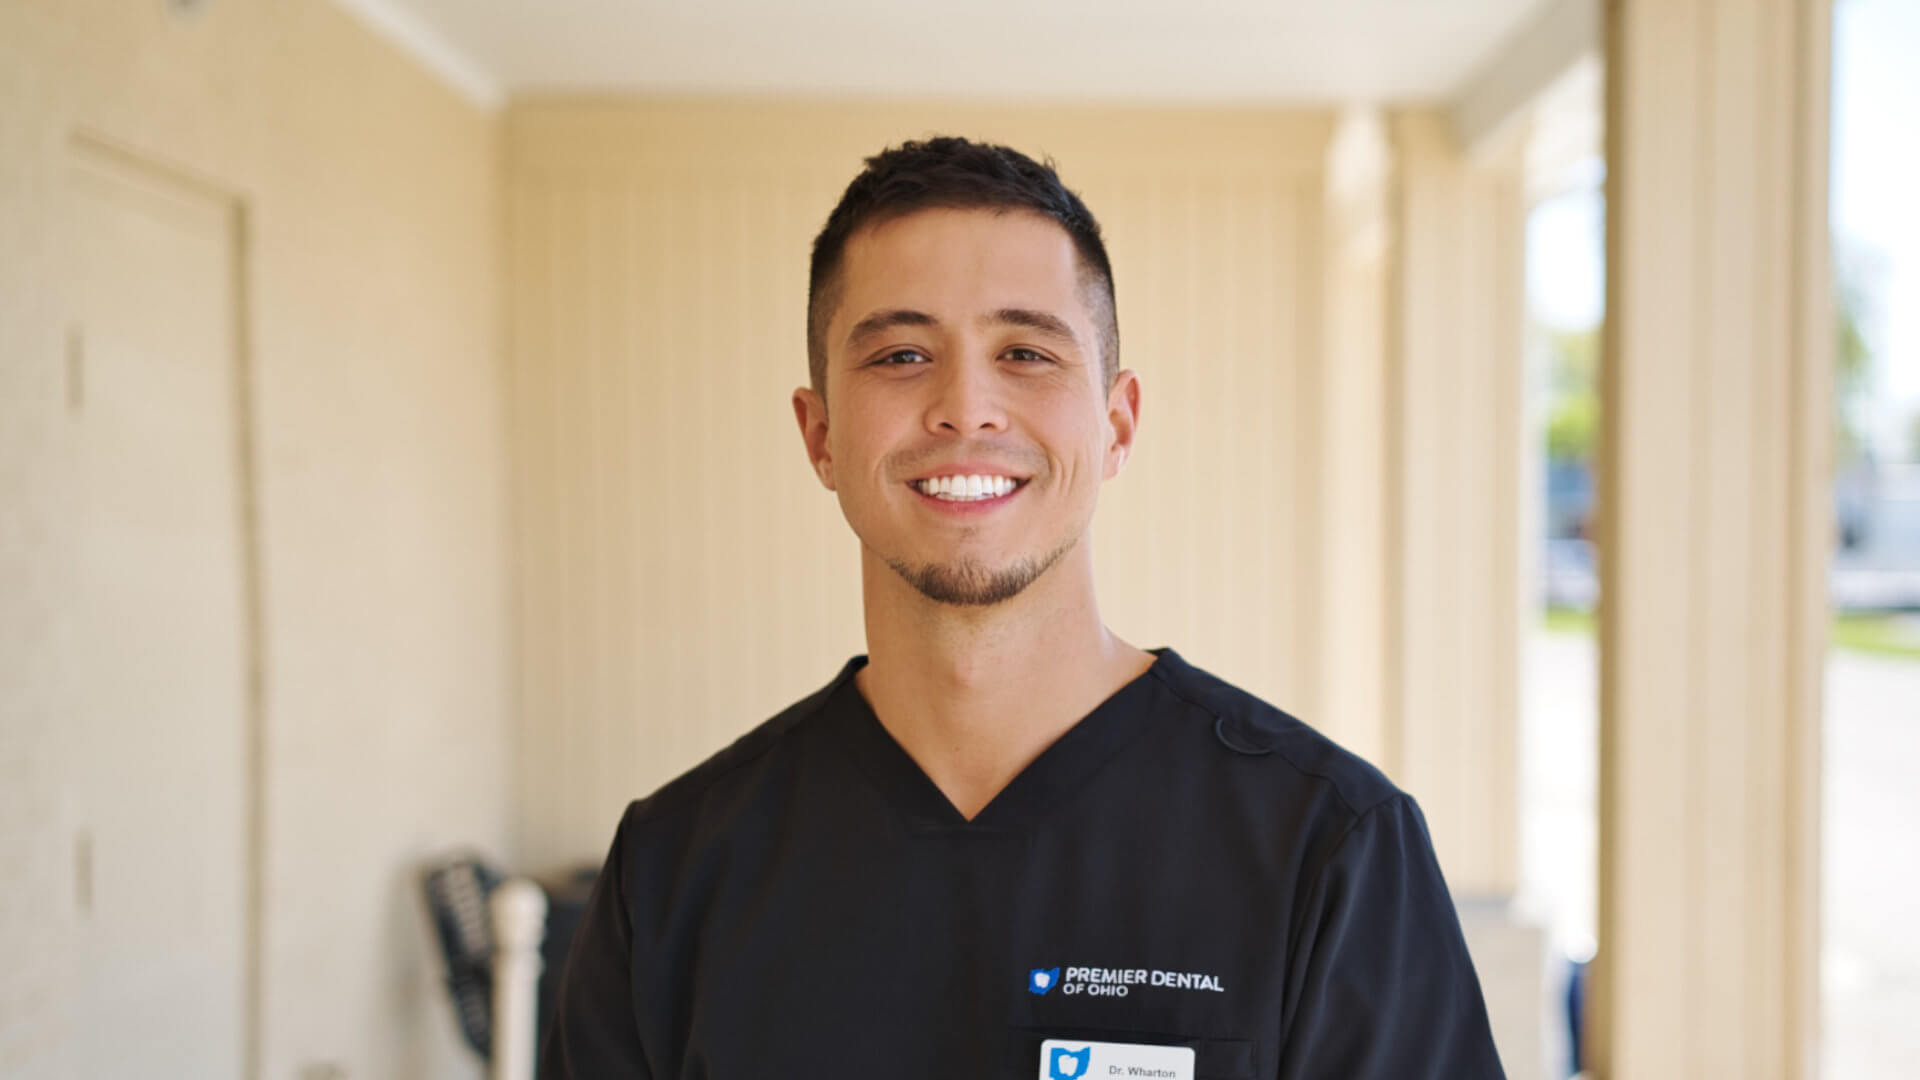 Premier Dental of Piqua